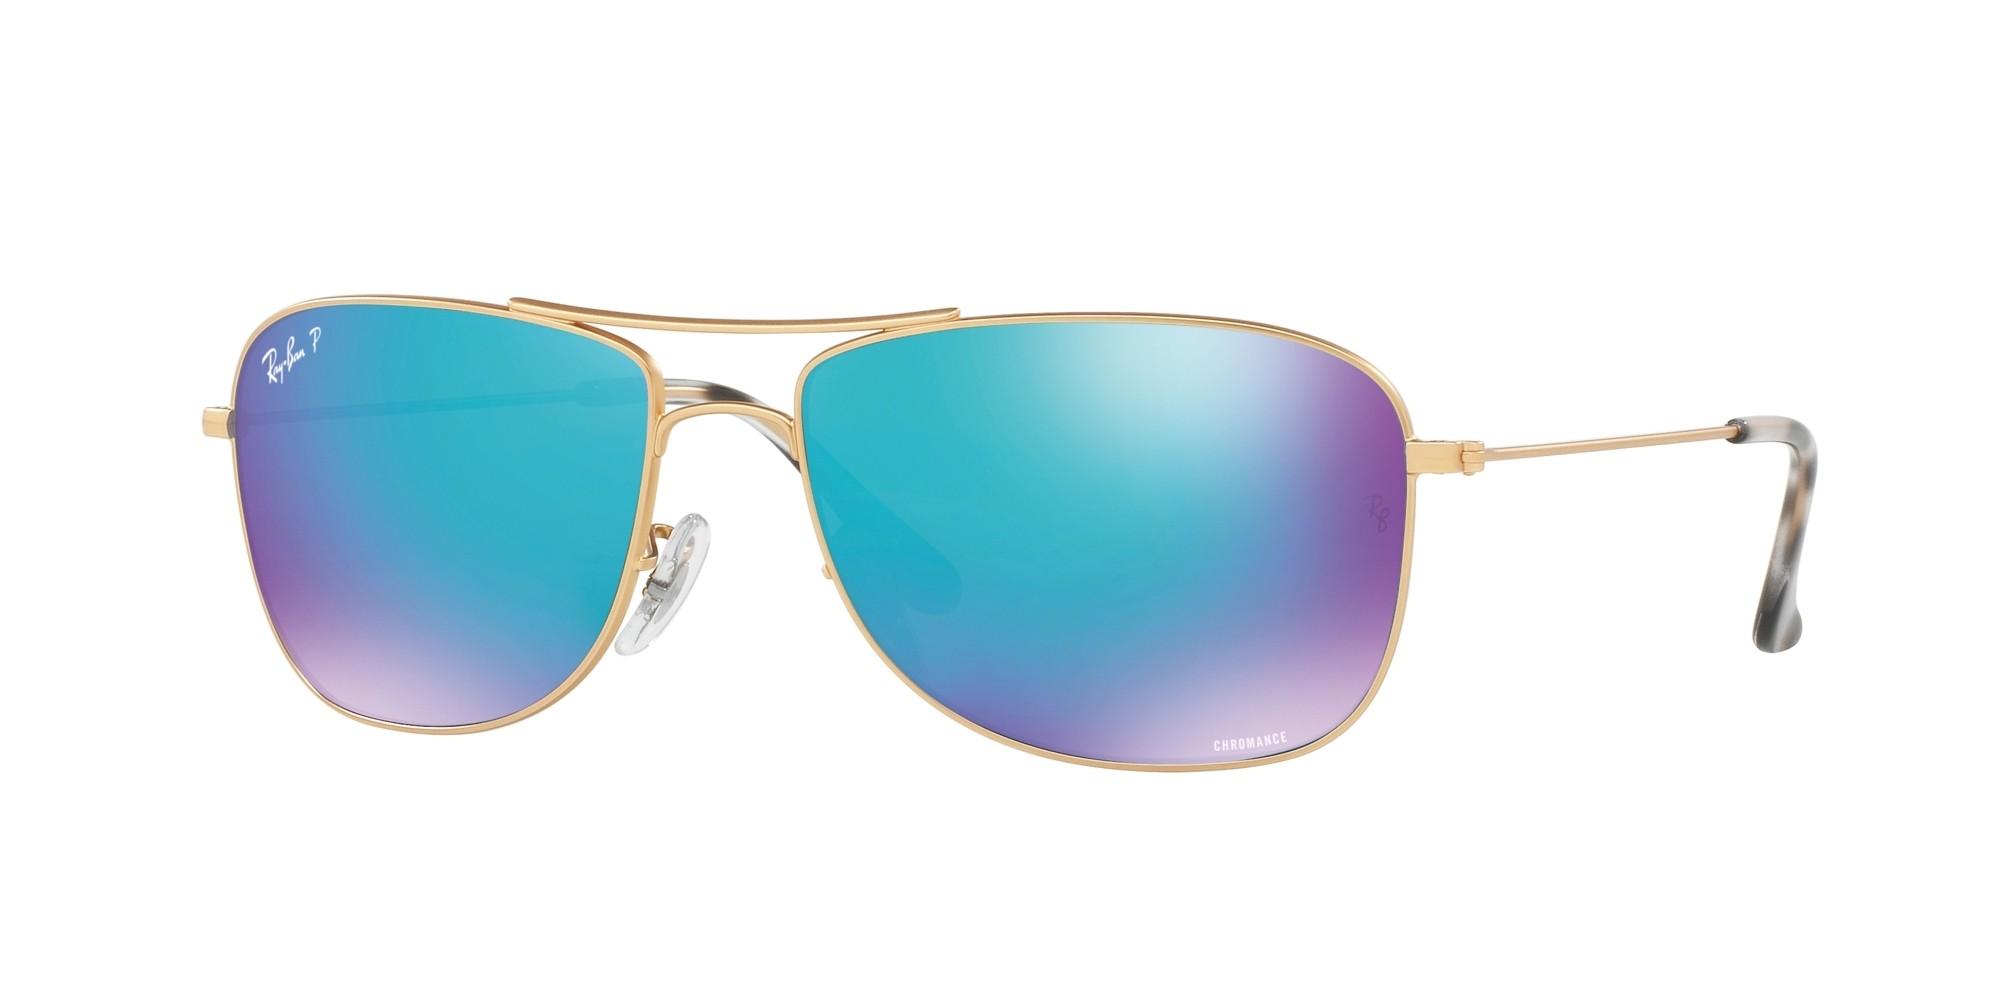 591fed40b3f Authentic Ray-Ban Rb3543 Prescription Sunglasses